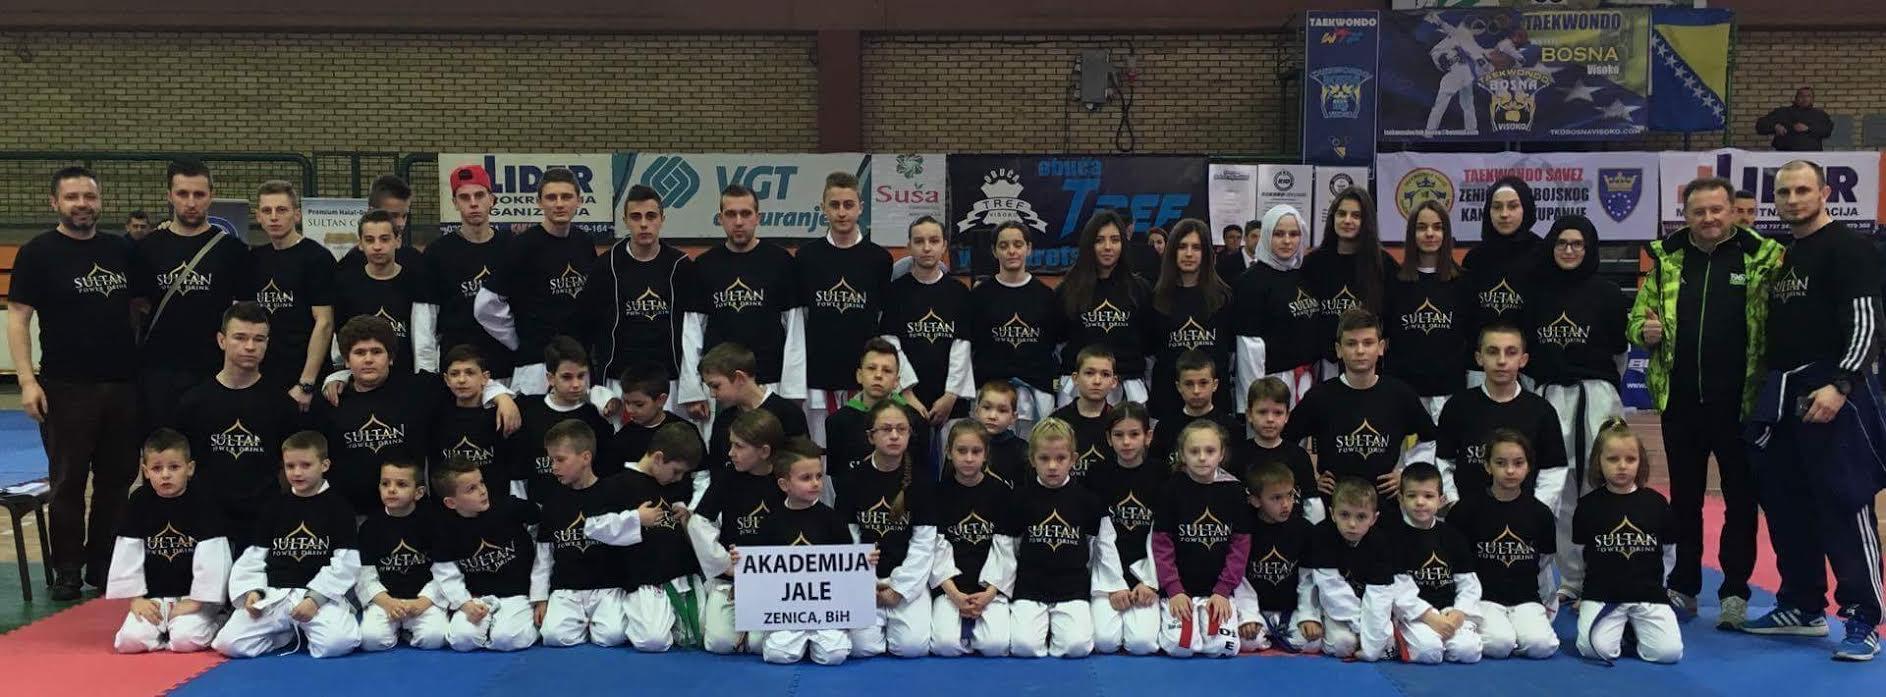 Taekwondo Akademija JALE